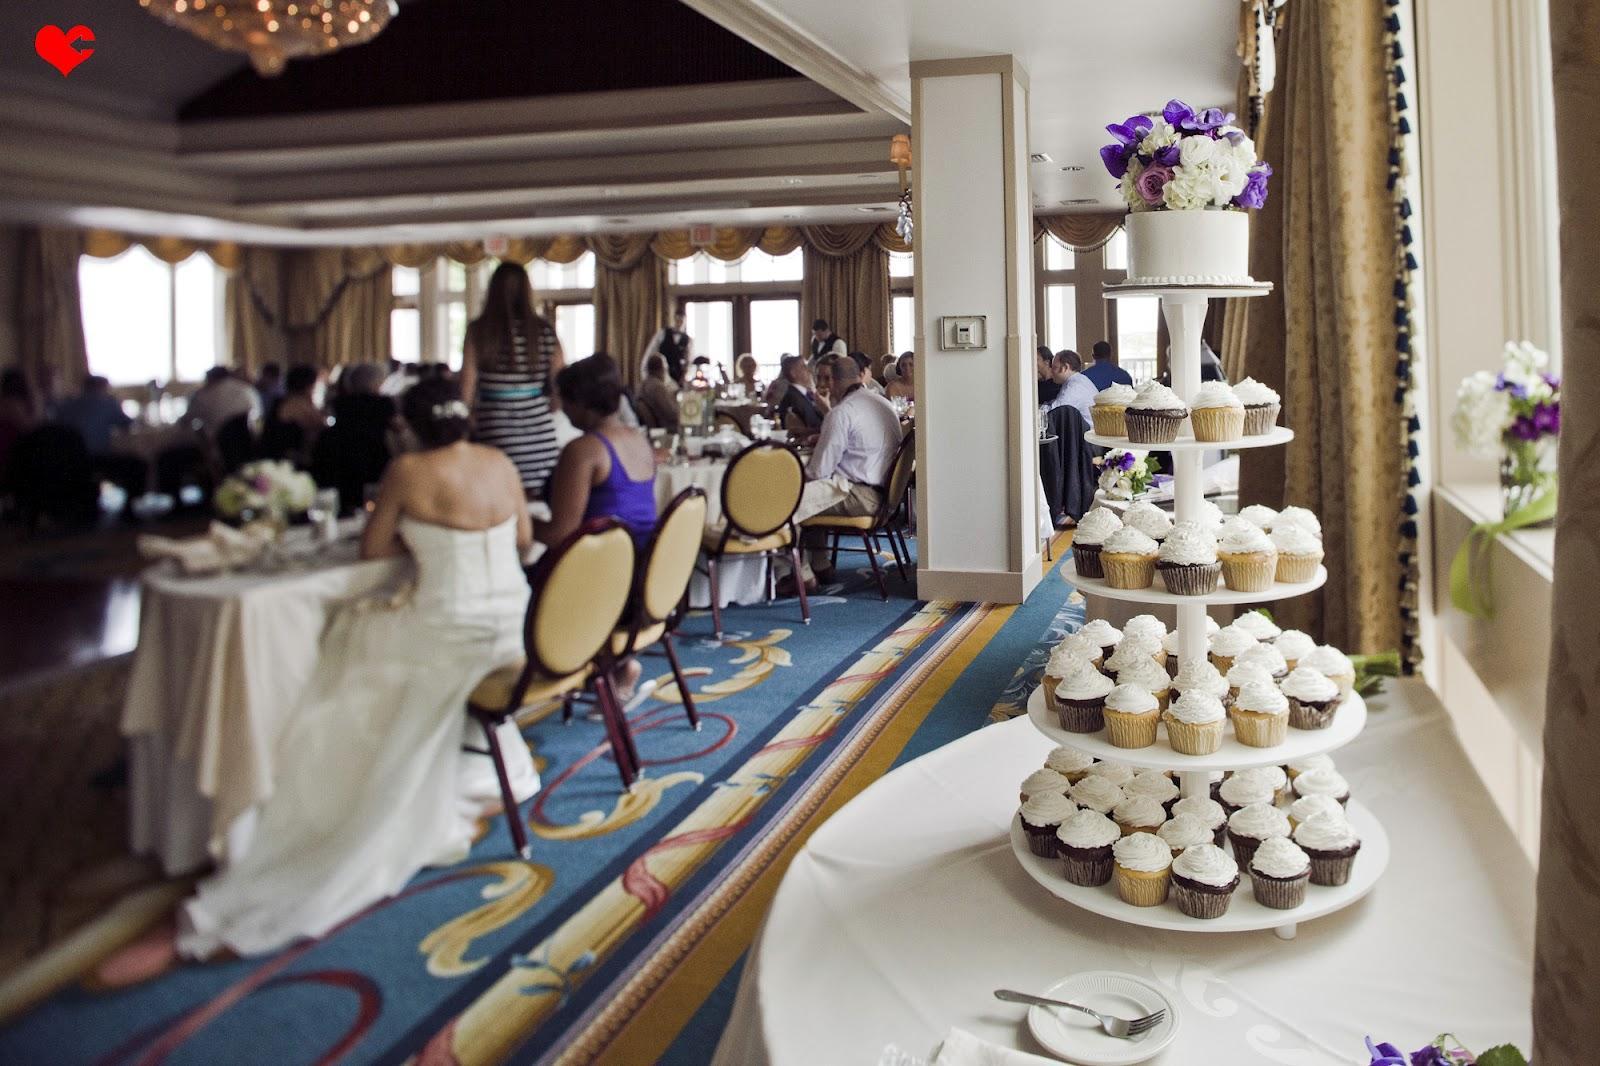 Water s Edge Resort and Spa - Venue - Westbrook, CT - WeddingWire Waters edge ct wedding photos